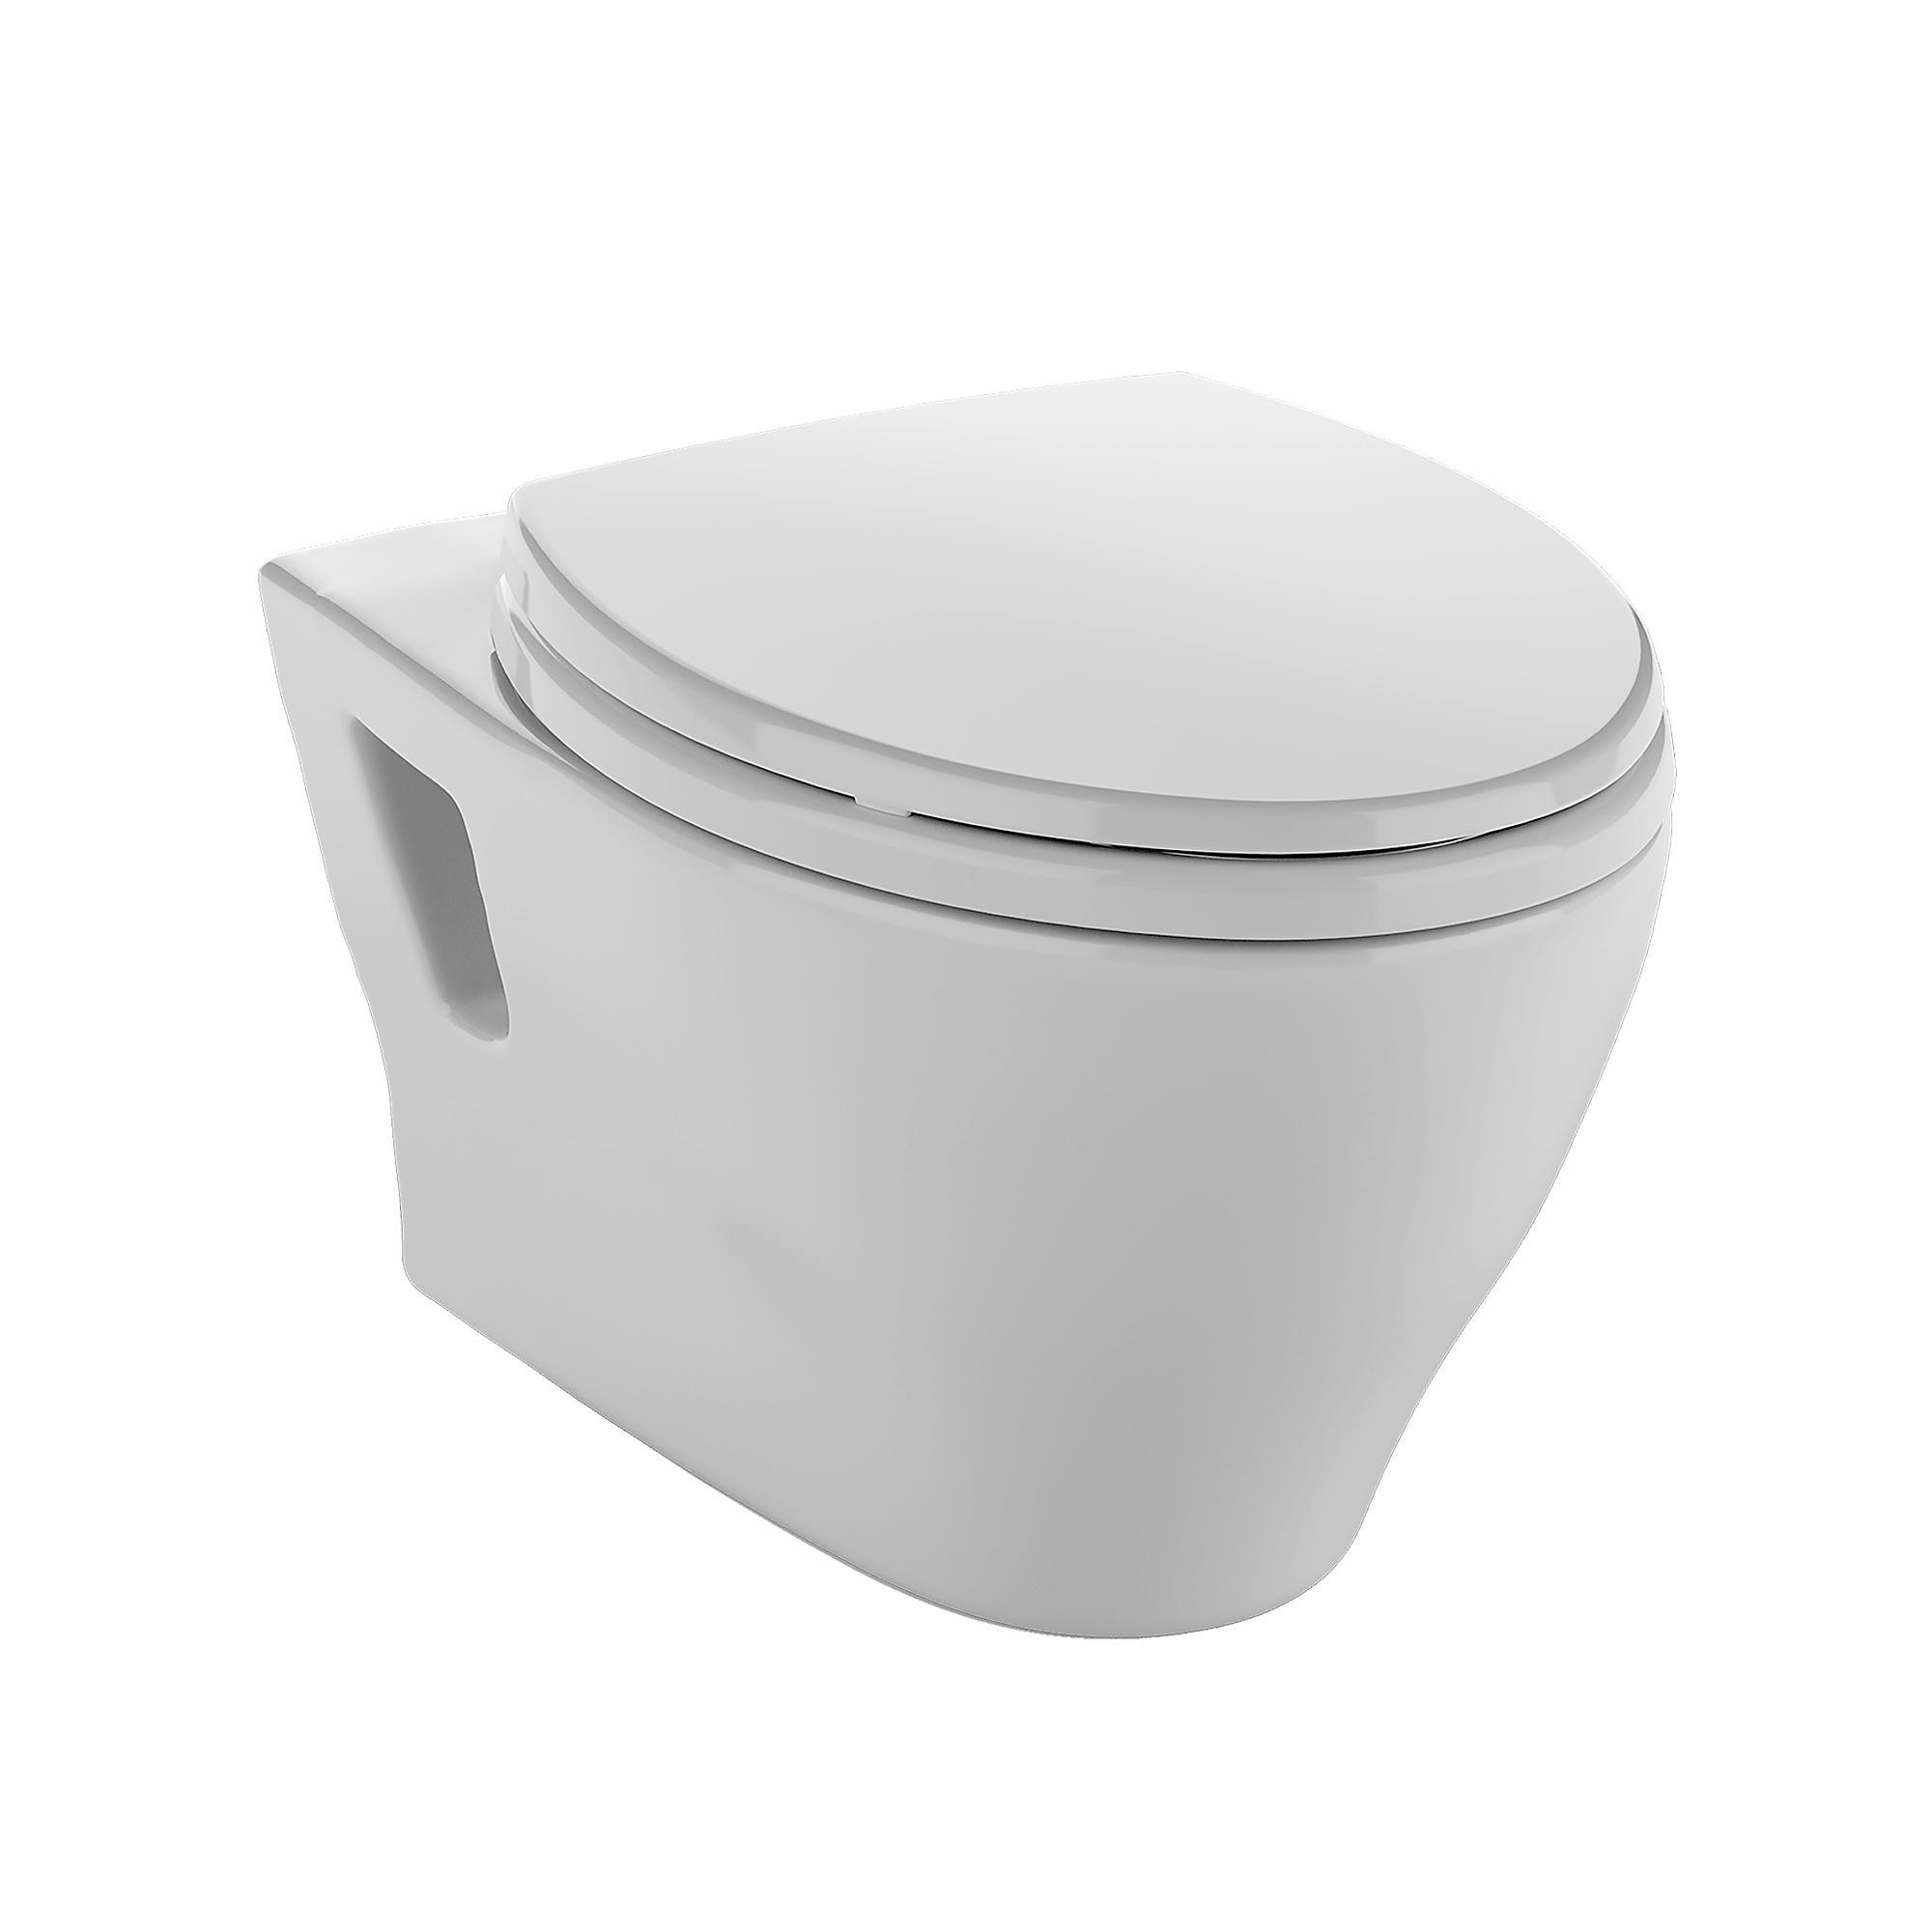 Ct418fg 01 aquia  wall hung dual flush toilet  1 6 gpf   0 9 gpf  elongated bowl 0